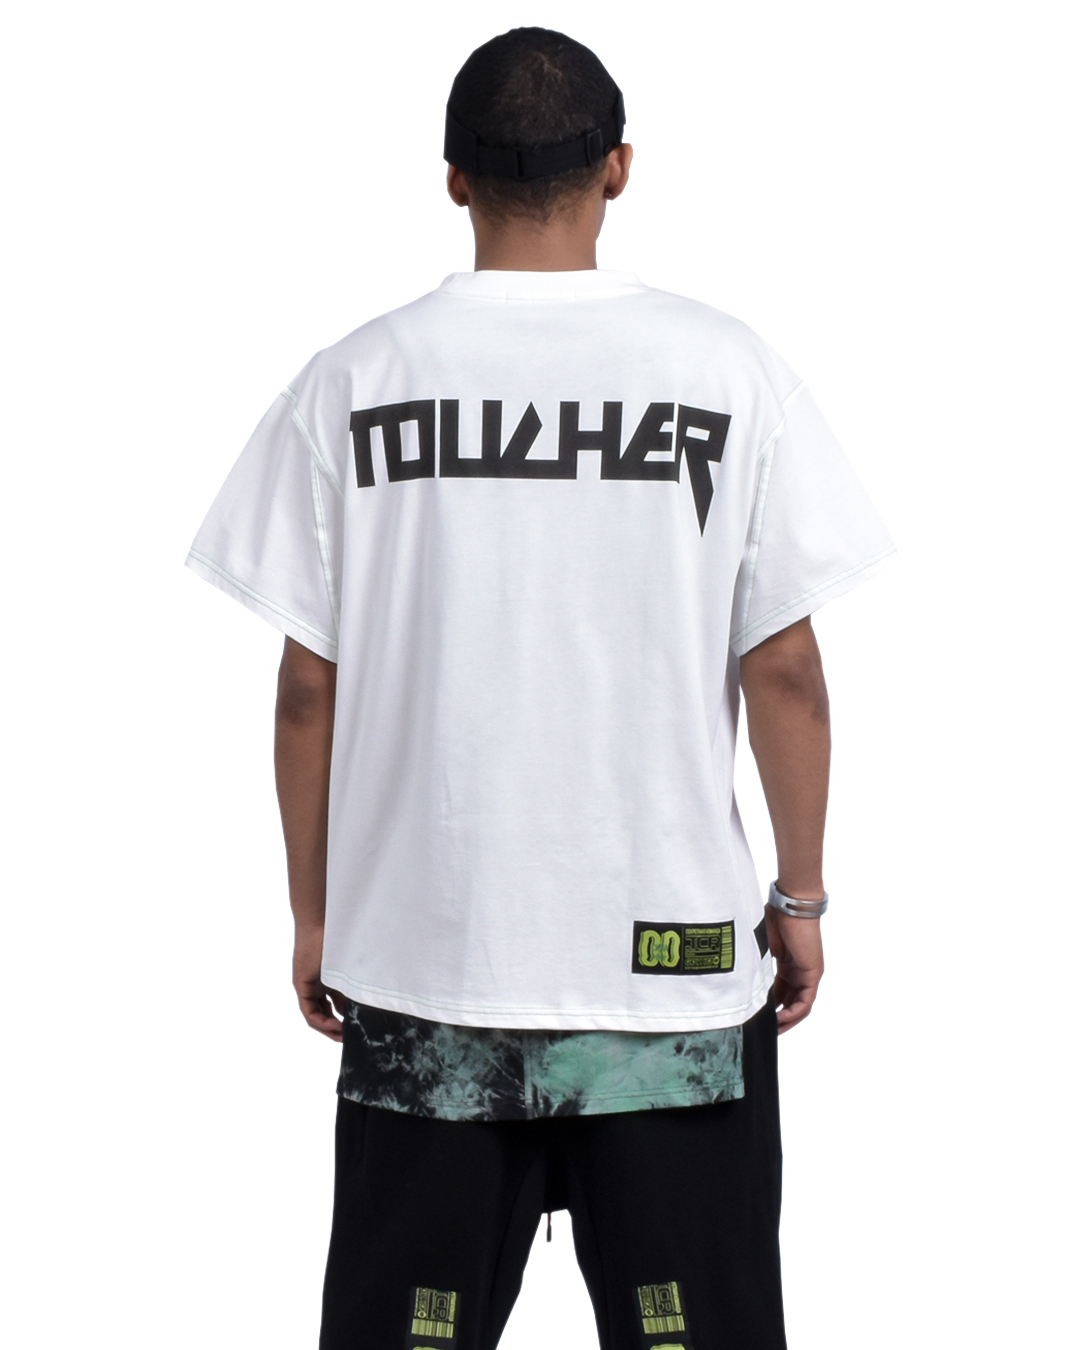 TOUCHER OVERSIZED  S/S TEE - WHITE/GREEN